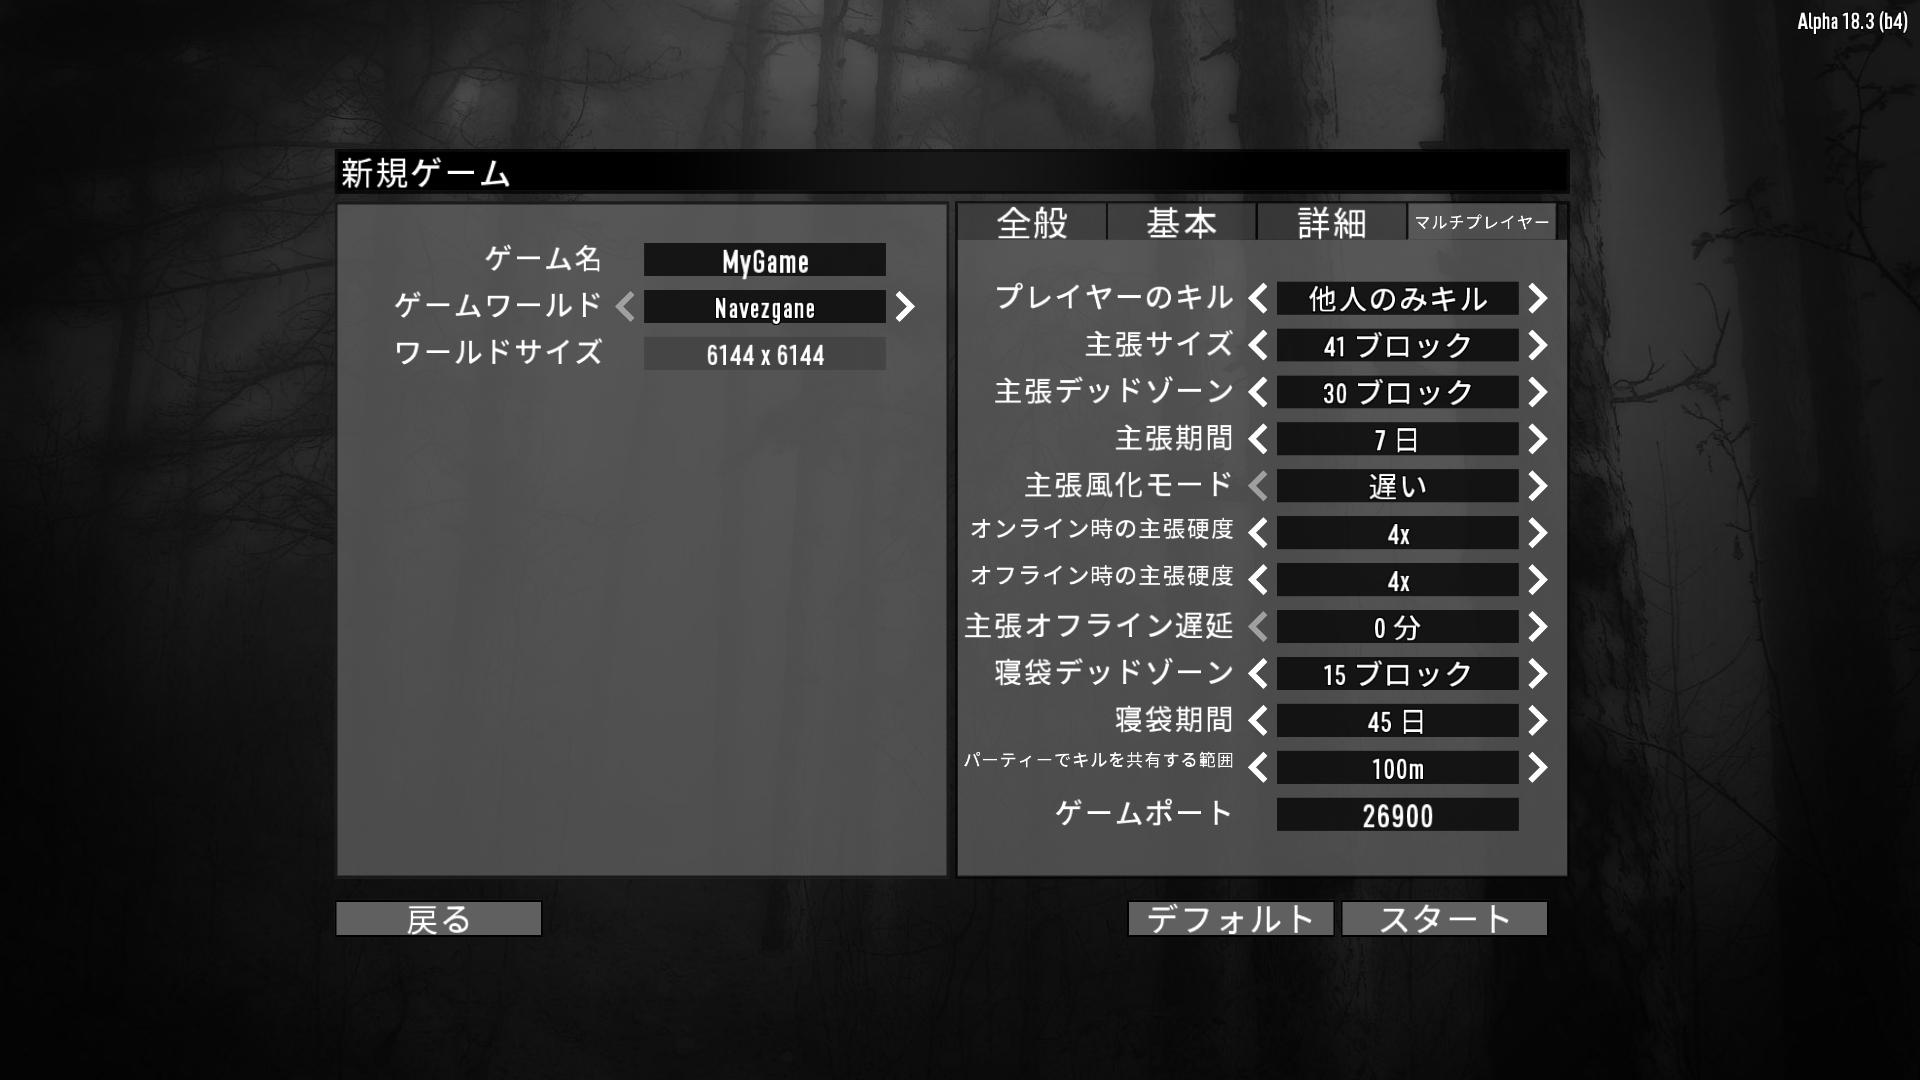 titleA18_Multiplayer_jp.jpg